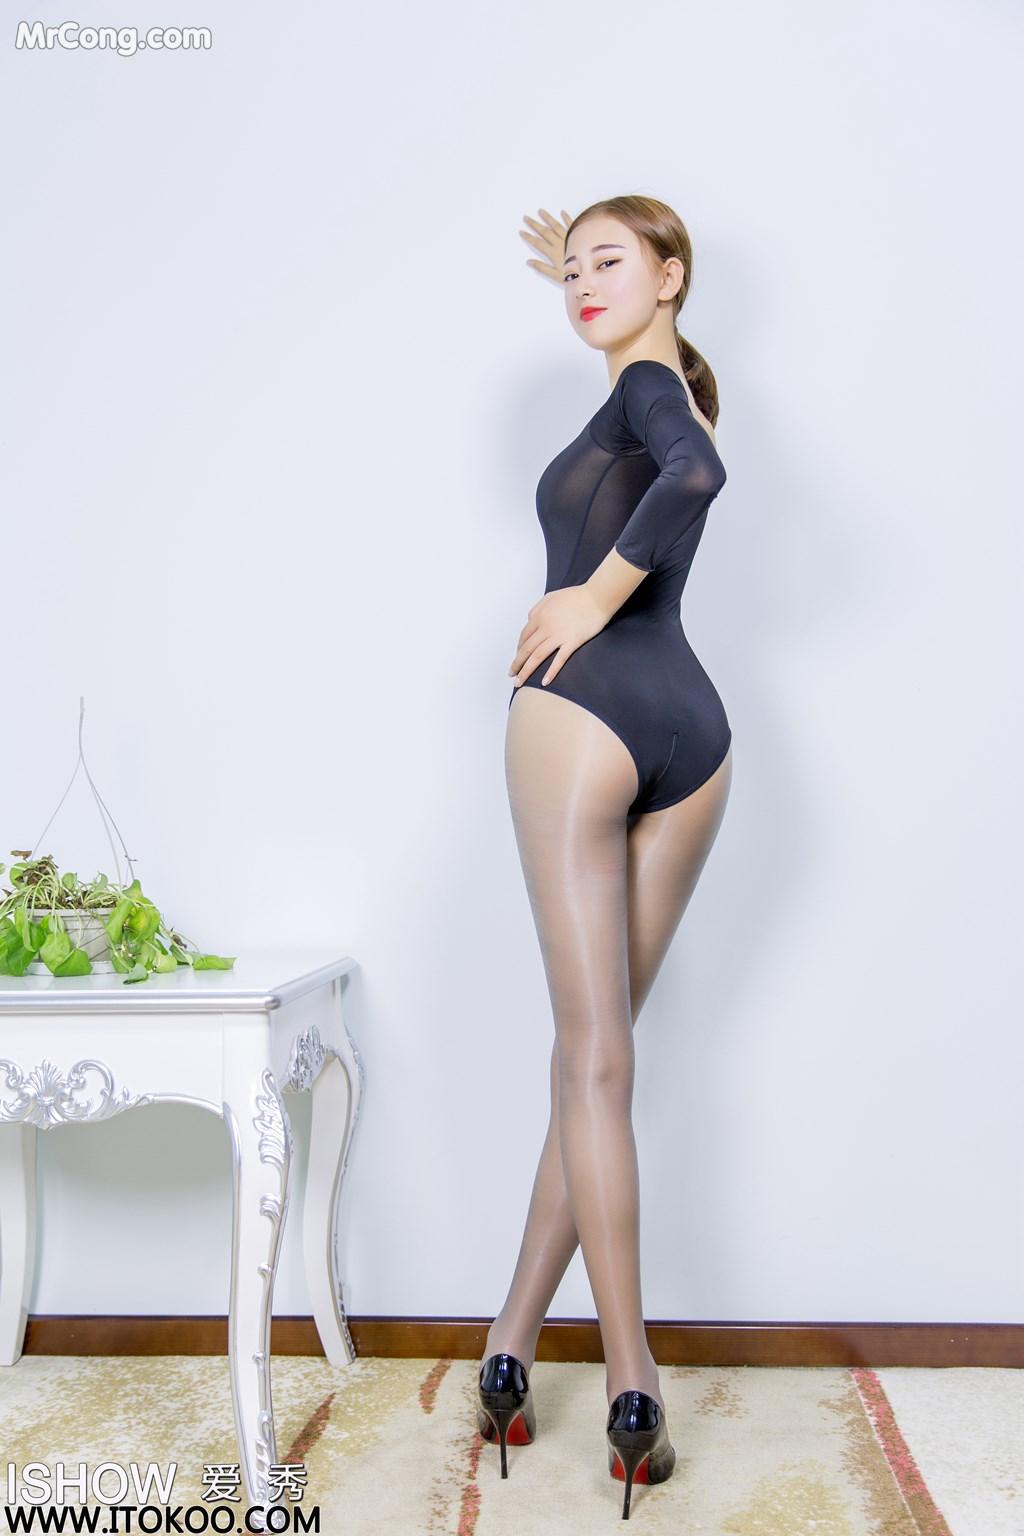 Image ISHOW-No.151-Han-Zhi-Ying-Flora-MrCong.com-005 in post ISHOW No.151: Người mẫu Han Zhi Ying (寒栀樱Flora) (31 ảnh)